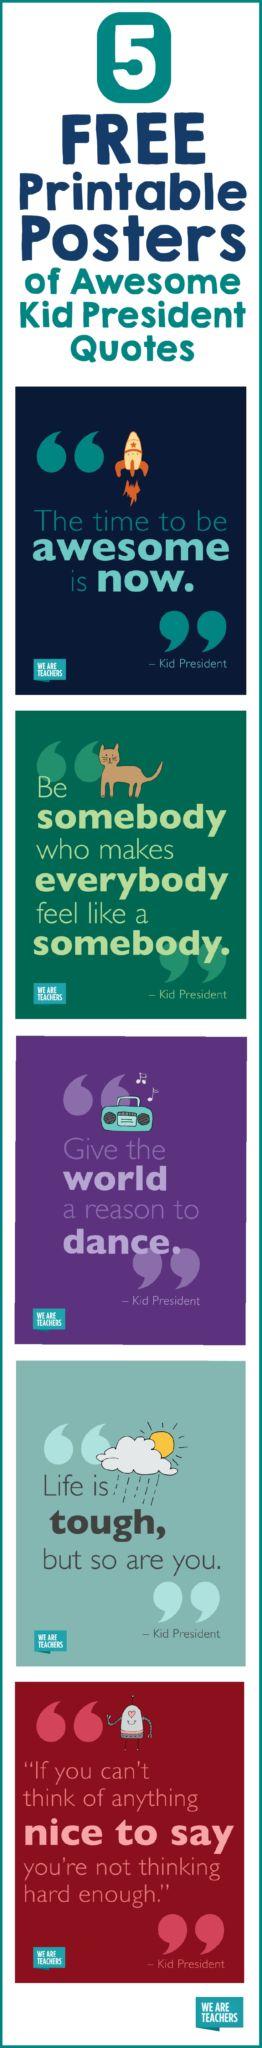 Kid President Quotes: Free Printable Posters - WeAreTeachers